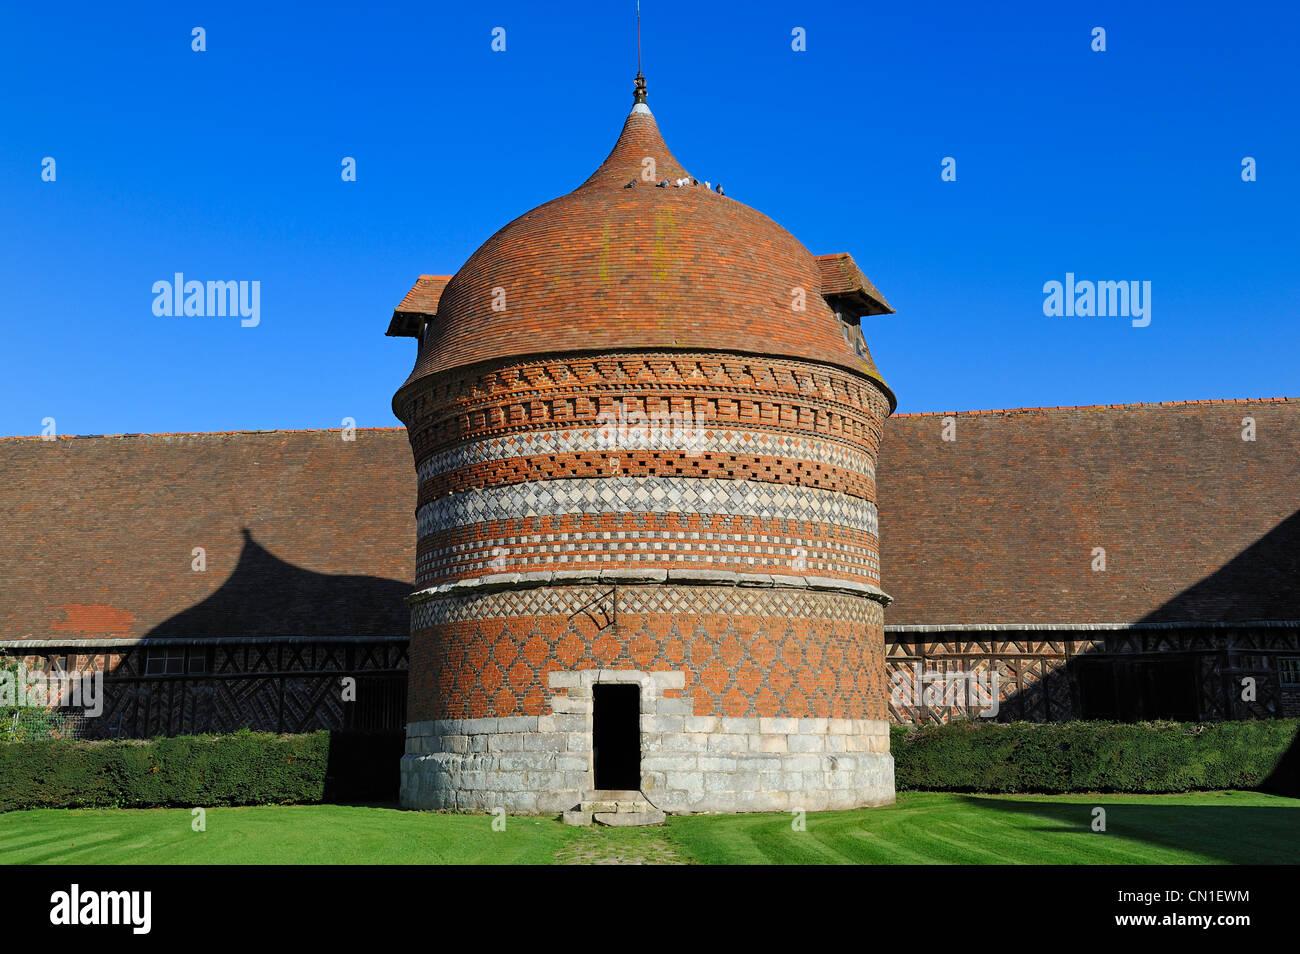 France, Seine Maritime, Varengeville sur Mer, dovecote of the Manoir d' Ango (Ango Manor) - Stock Image